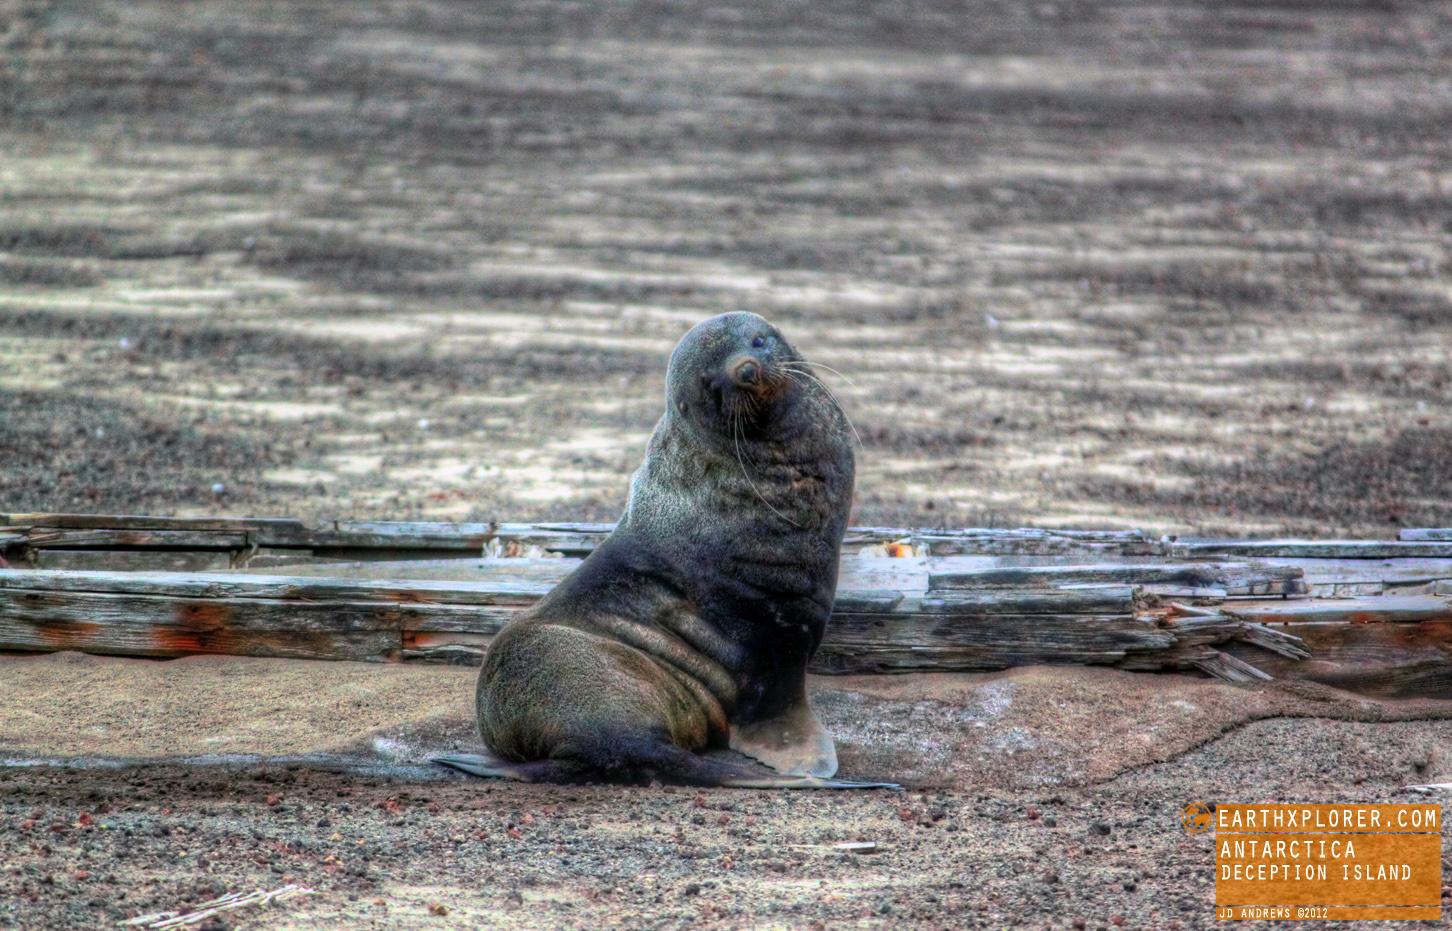 Whalers Bay in Deception Island